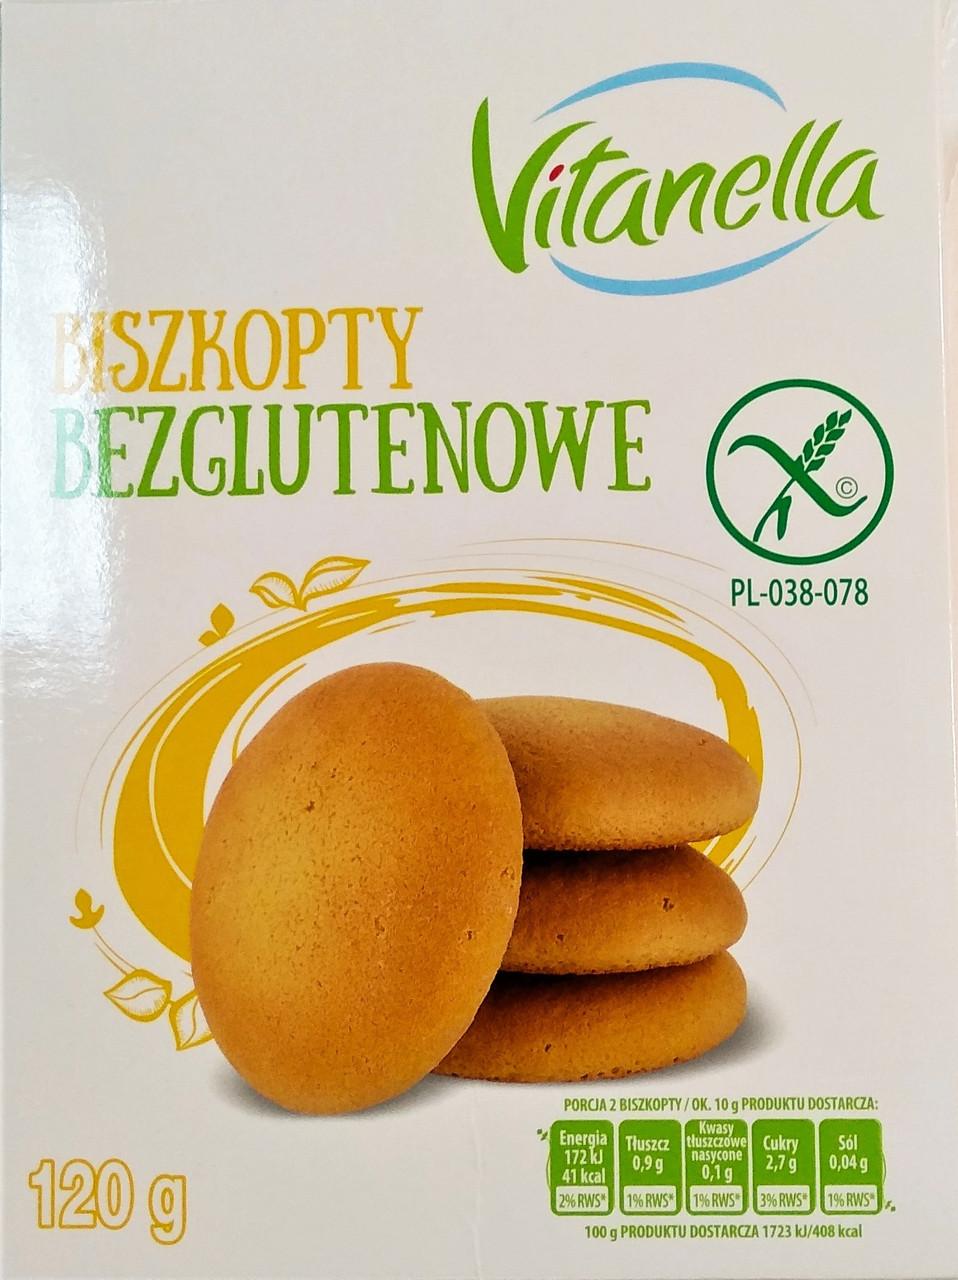 Бисквит Vitanella Biszkopty bezglutenowe 120 g